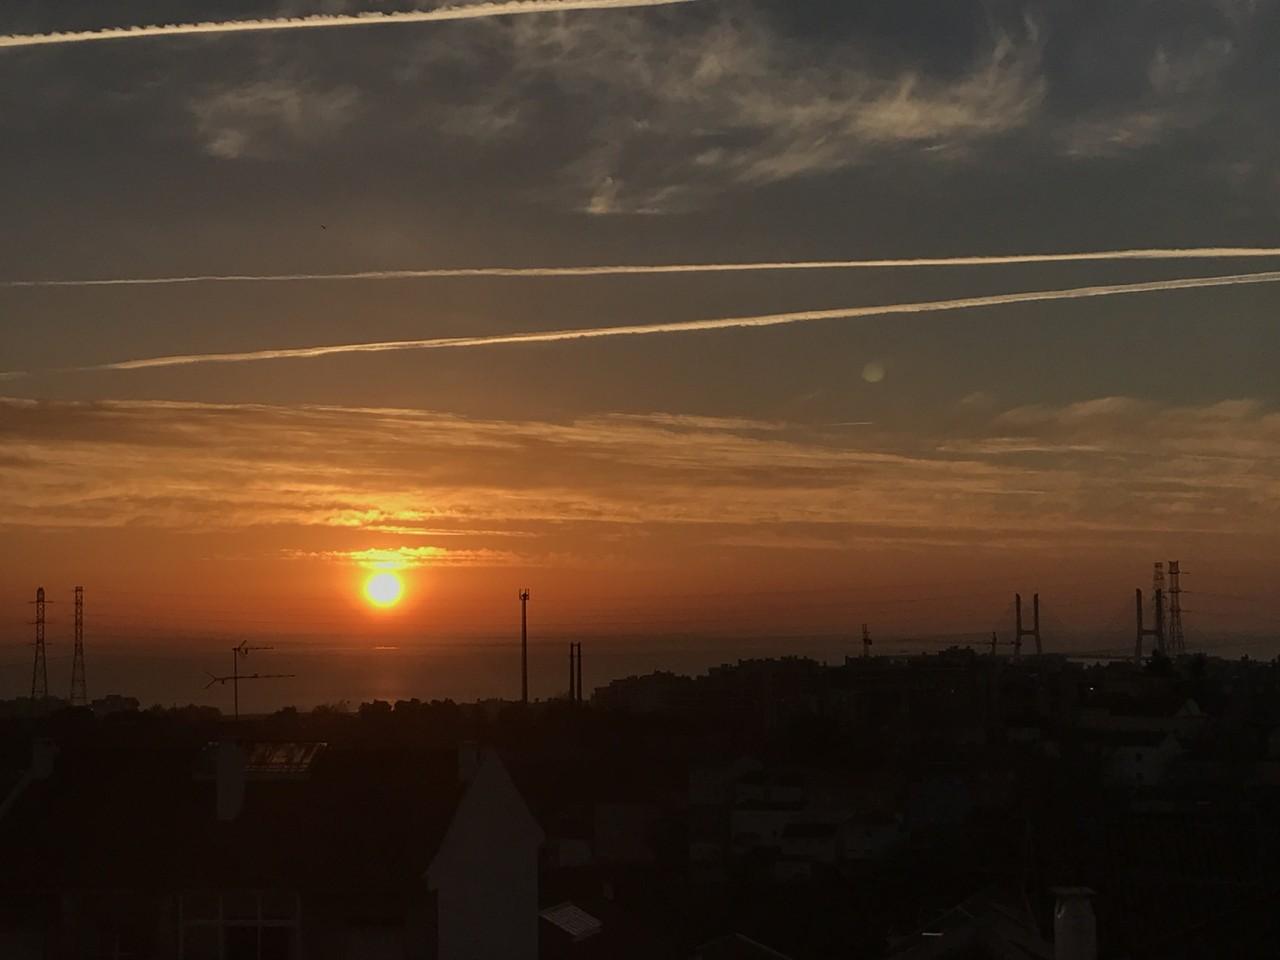 07:32